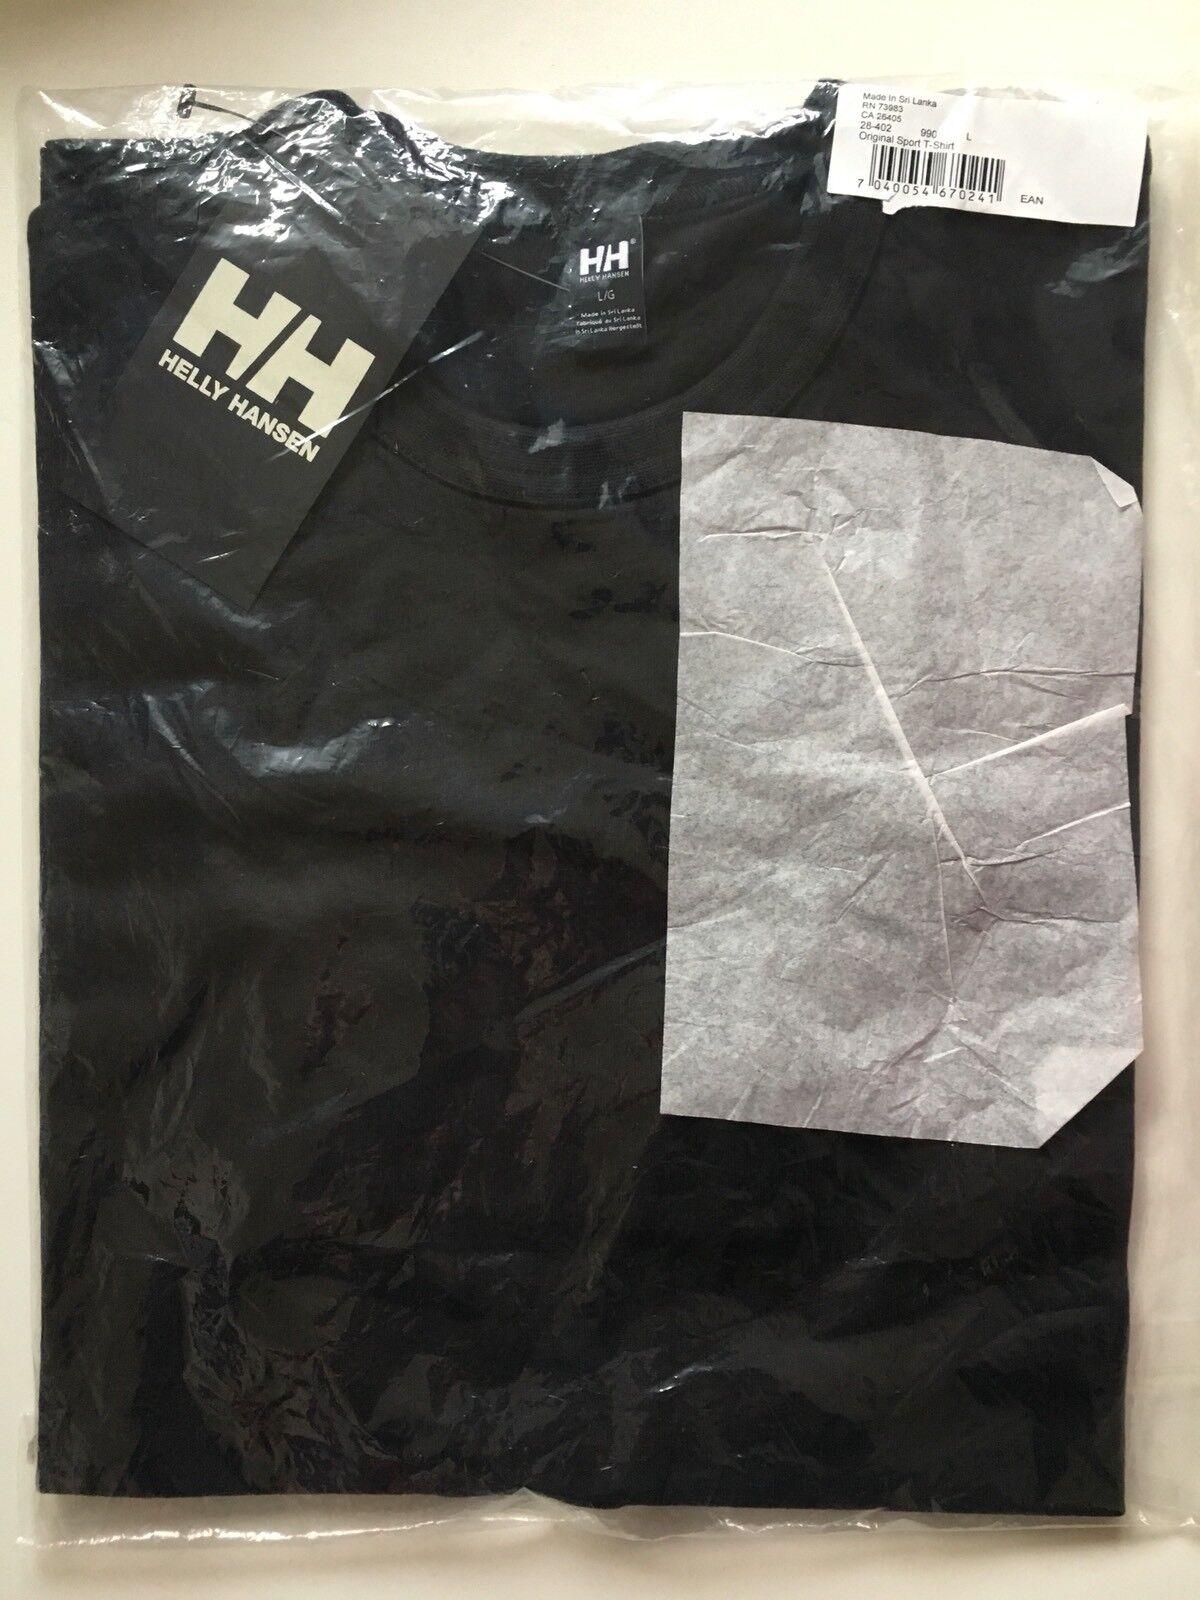 szybka dostawa przemyślenia na temat świetna jakość Helly Hansen Mens Original Sport T-shirt Black